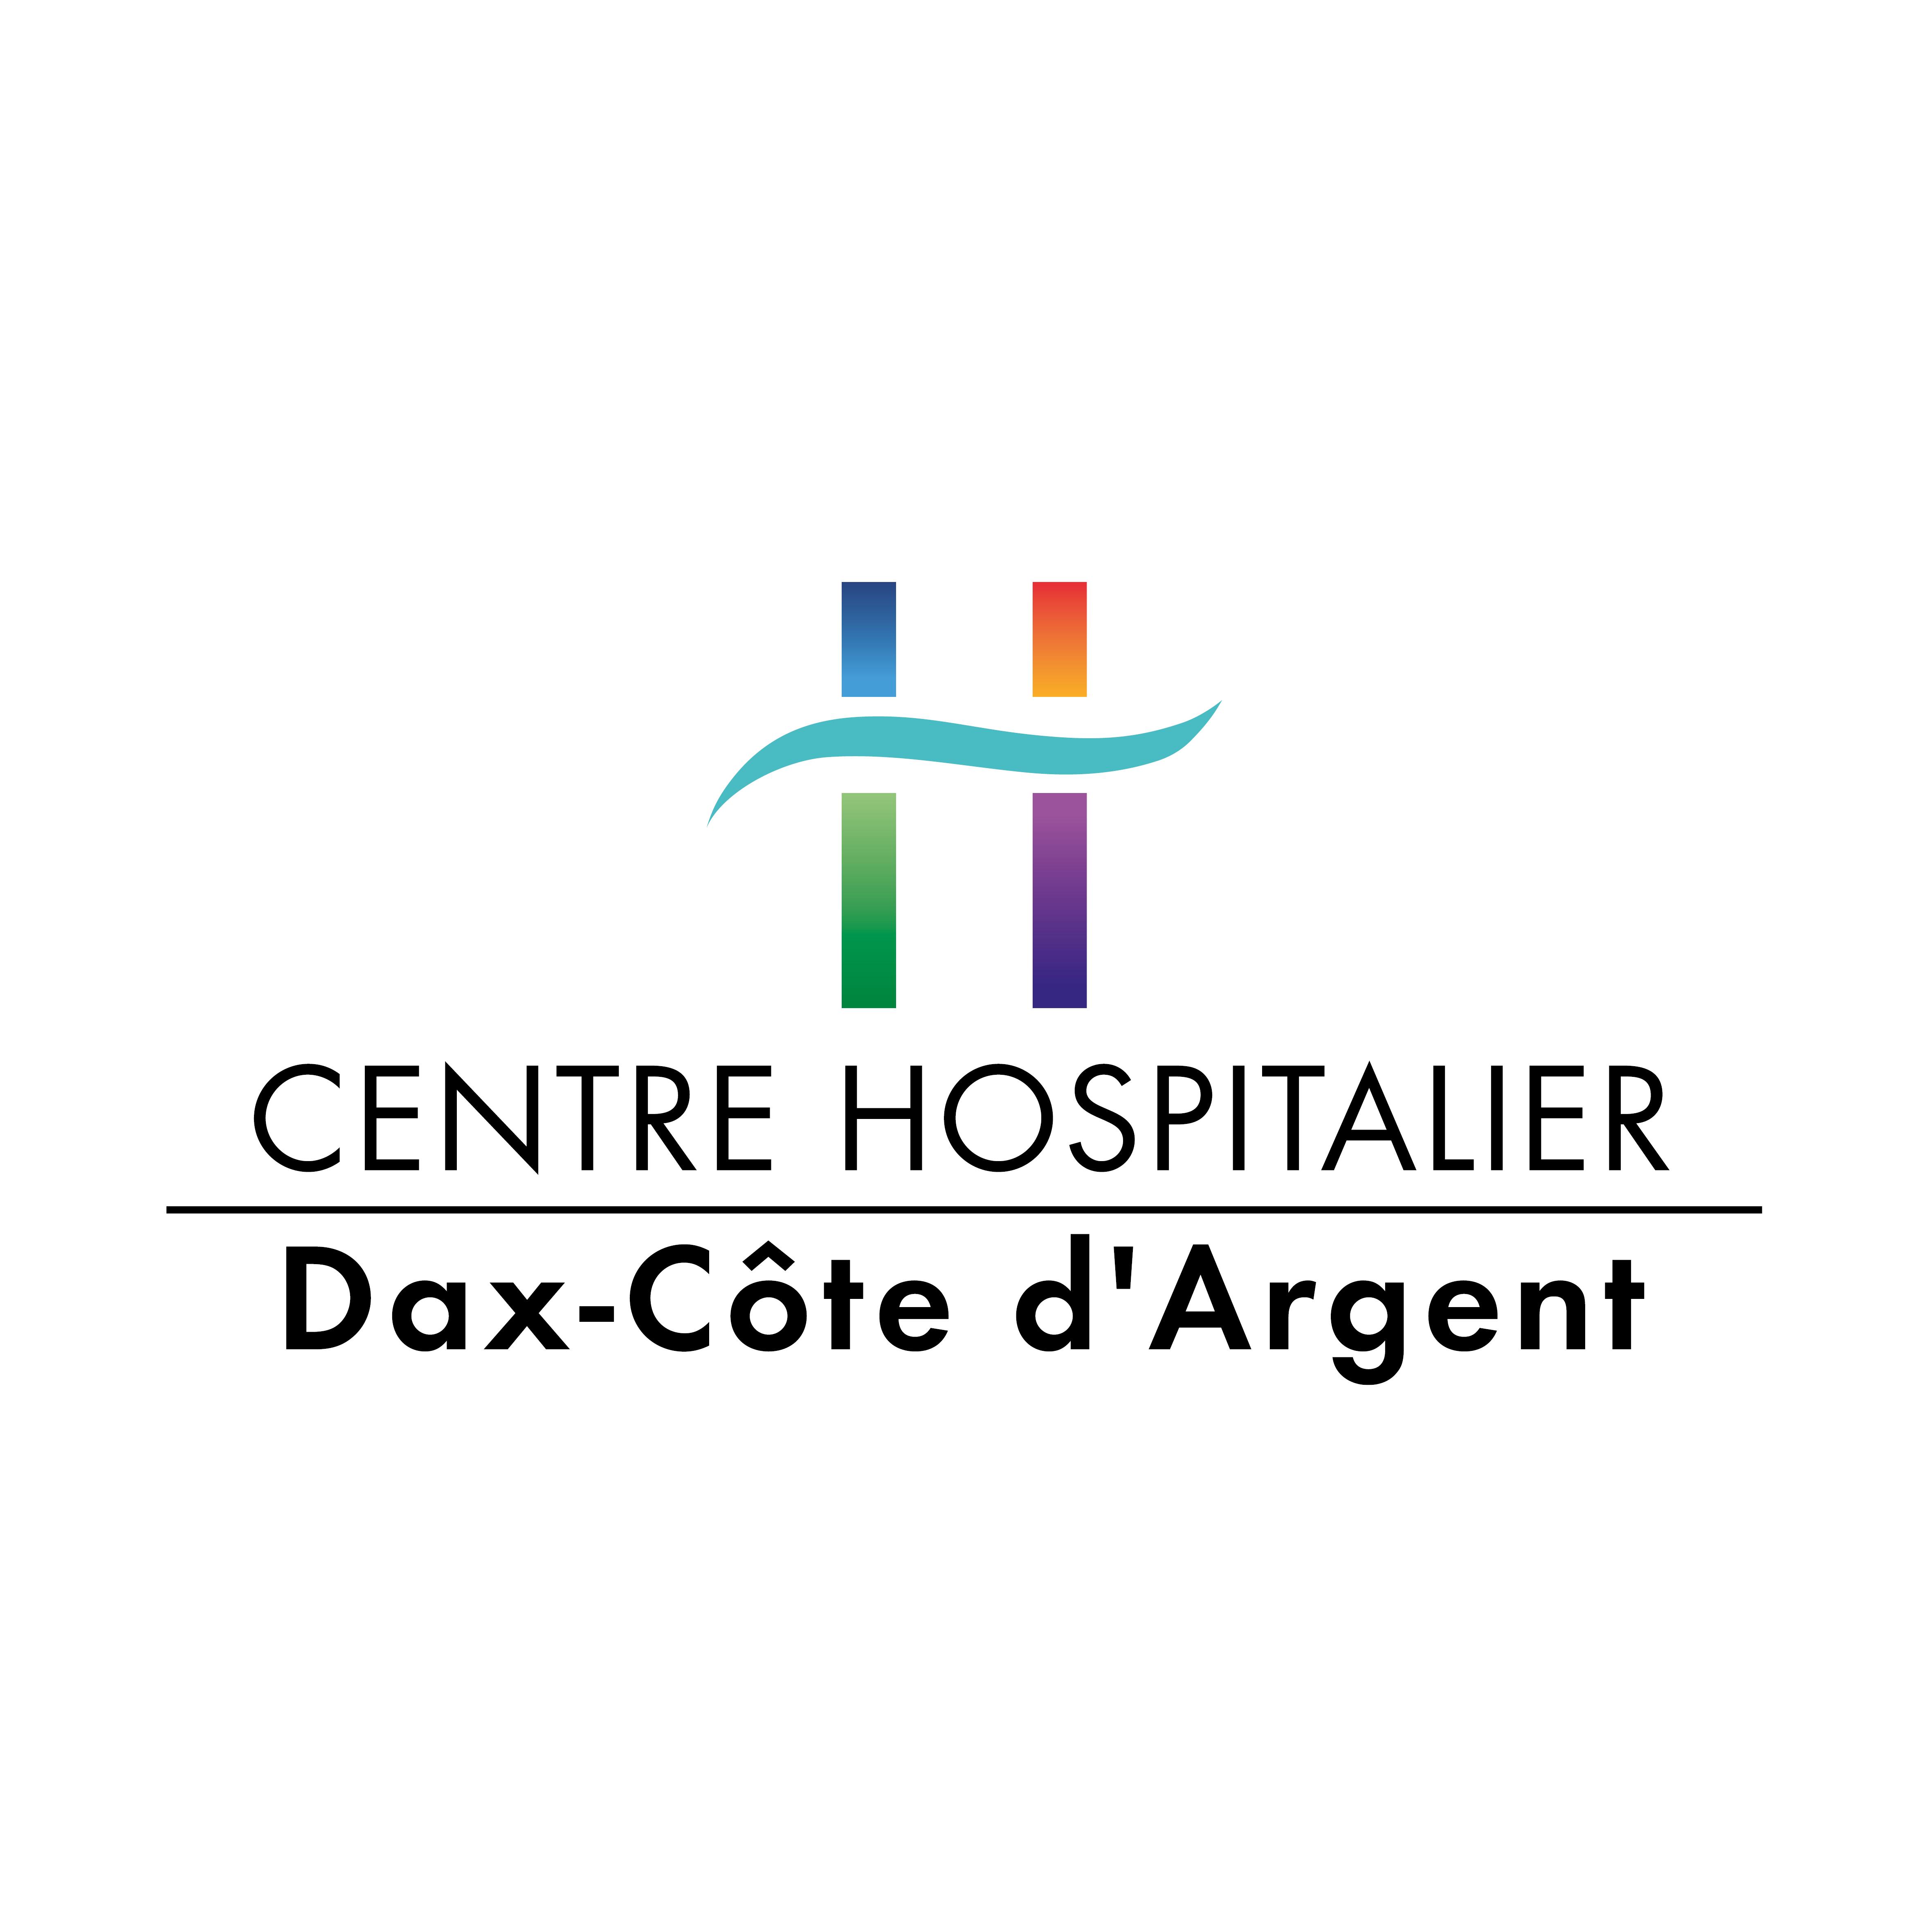 offres d u0026 39 emploi centre hospitalier de dax